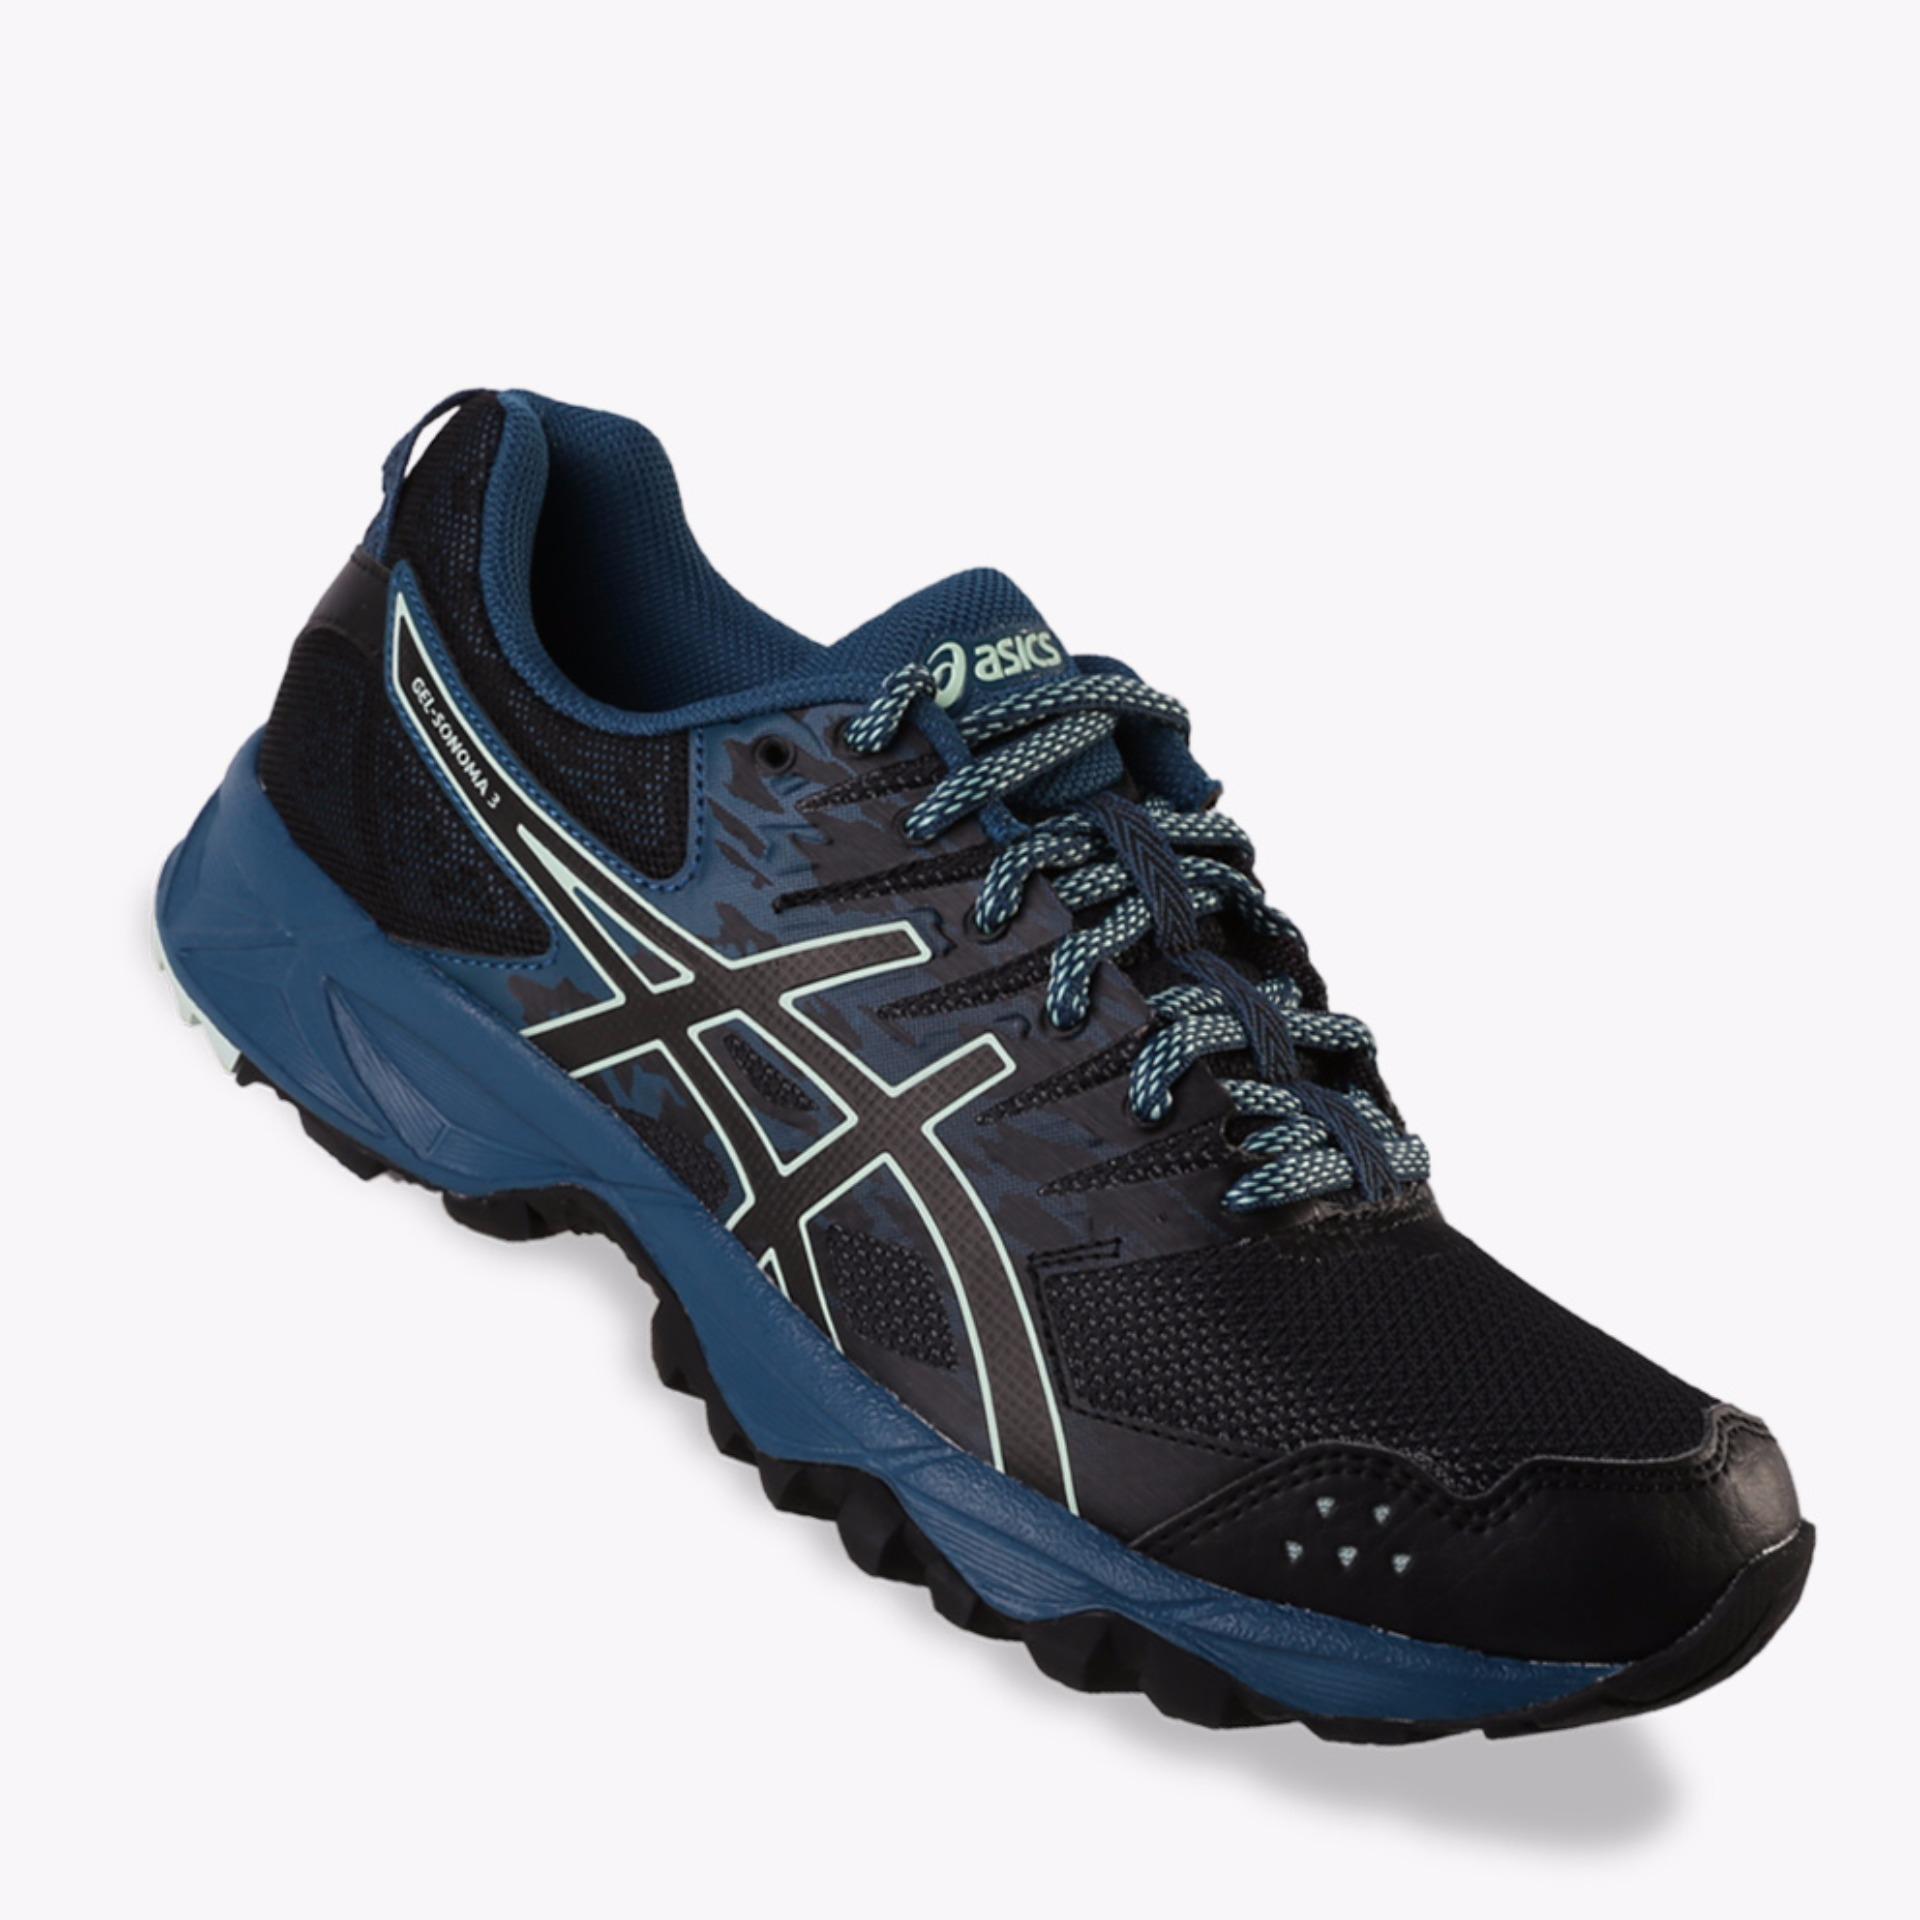 Harga Asics Gel Sonoma 3 Women S Trail Shoes Navy Lengkap